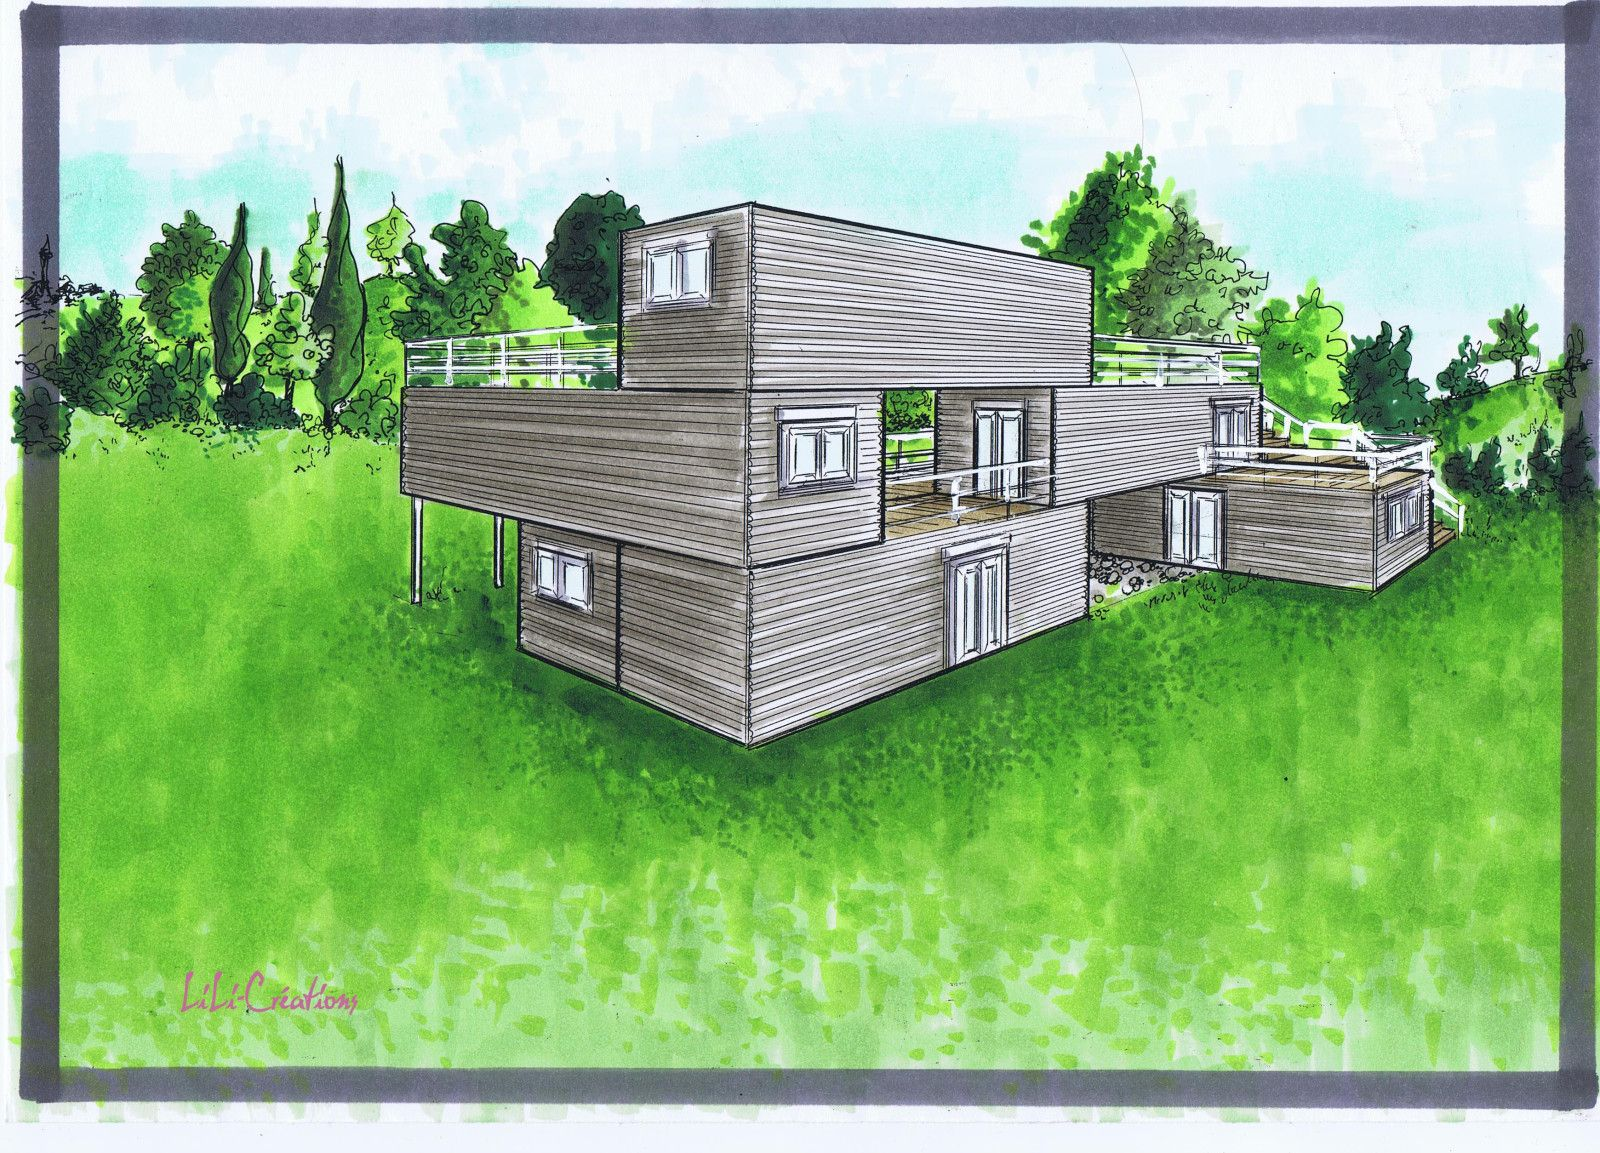 maison container 18 container homes plans maison. Black Bedroom Furniture Sets. Home Design Ideas